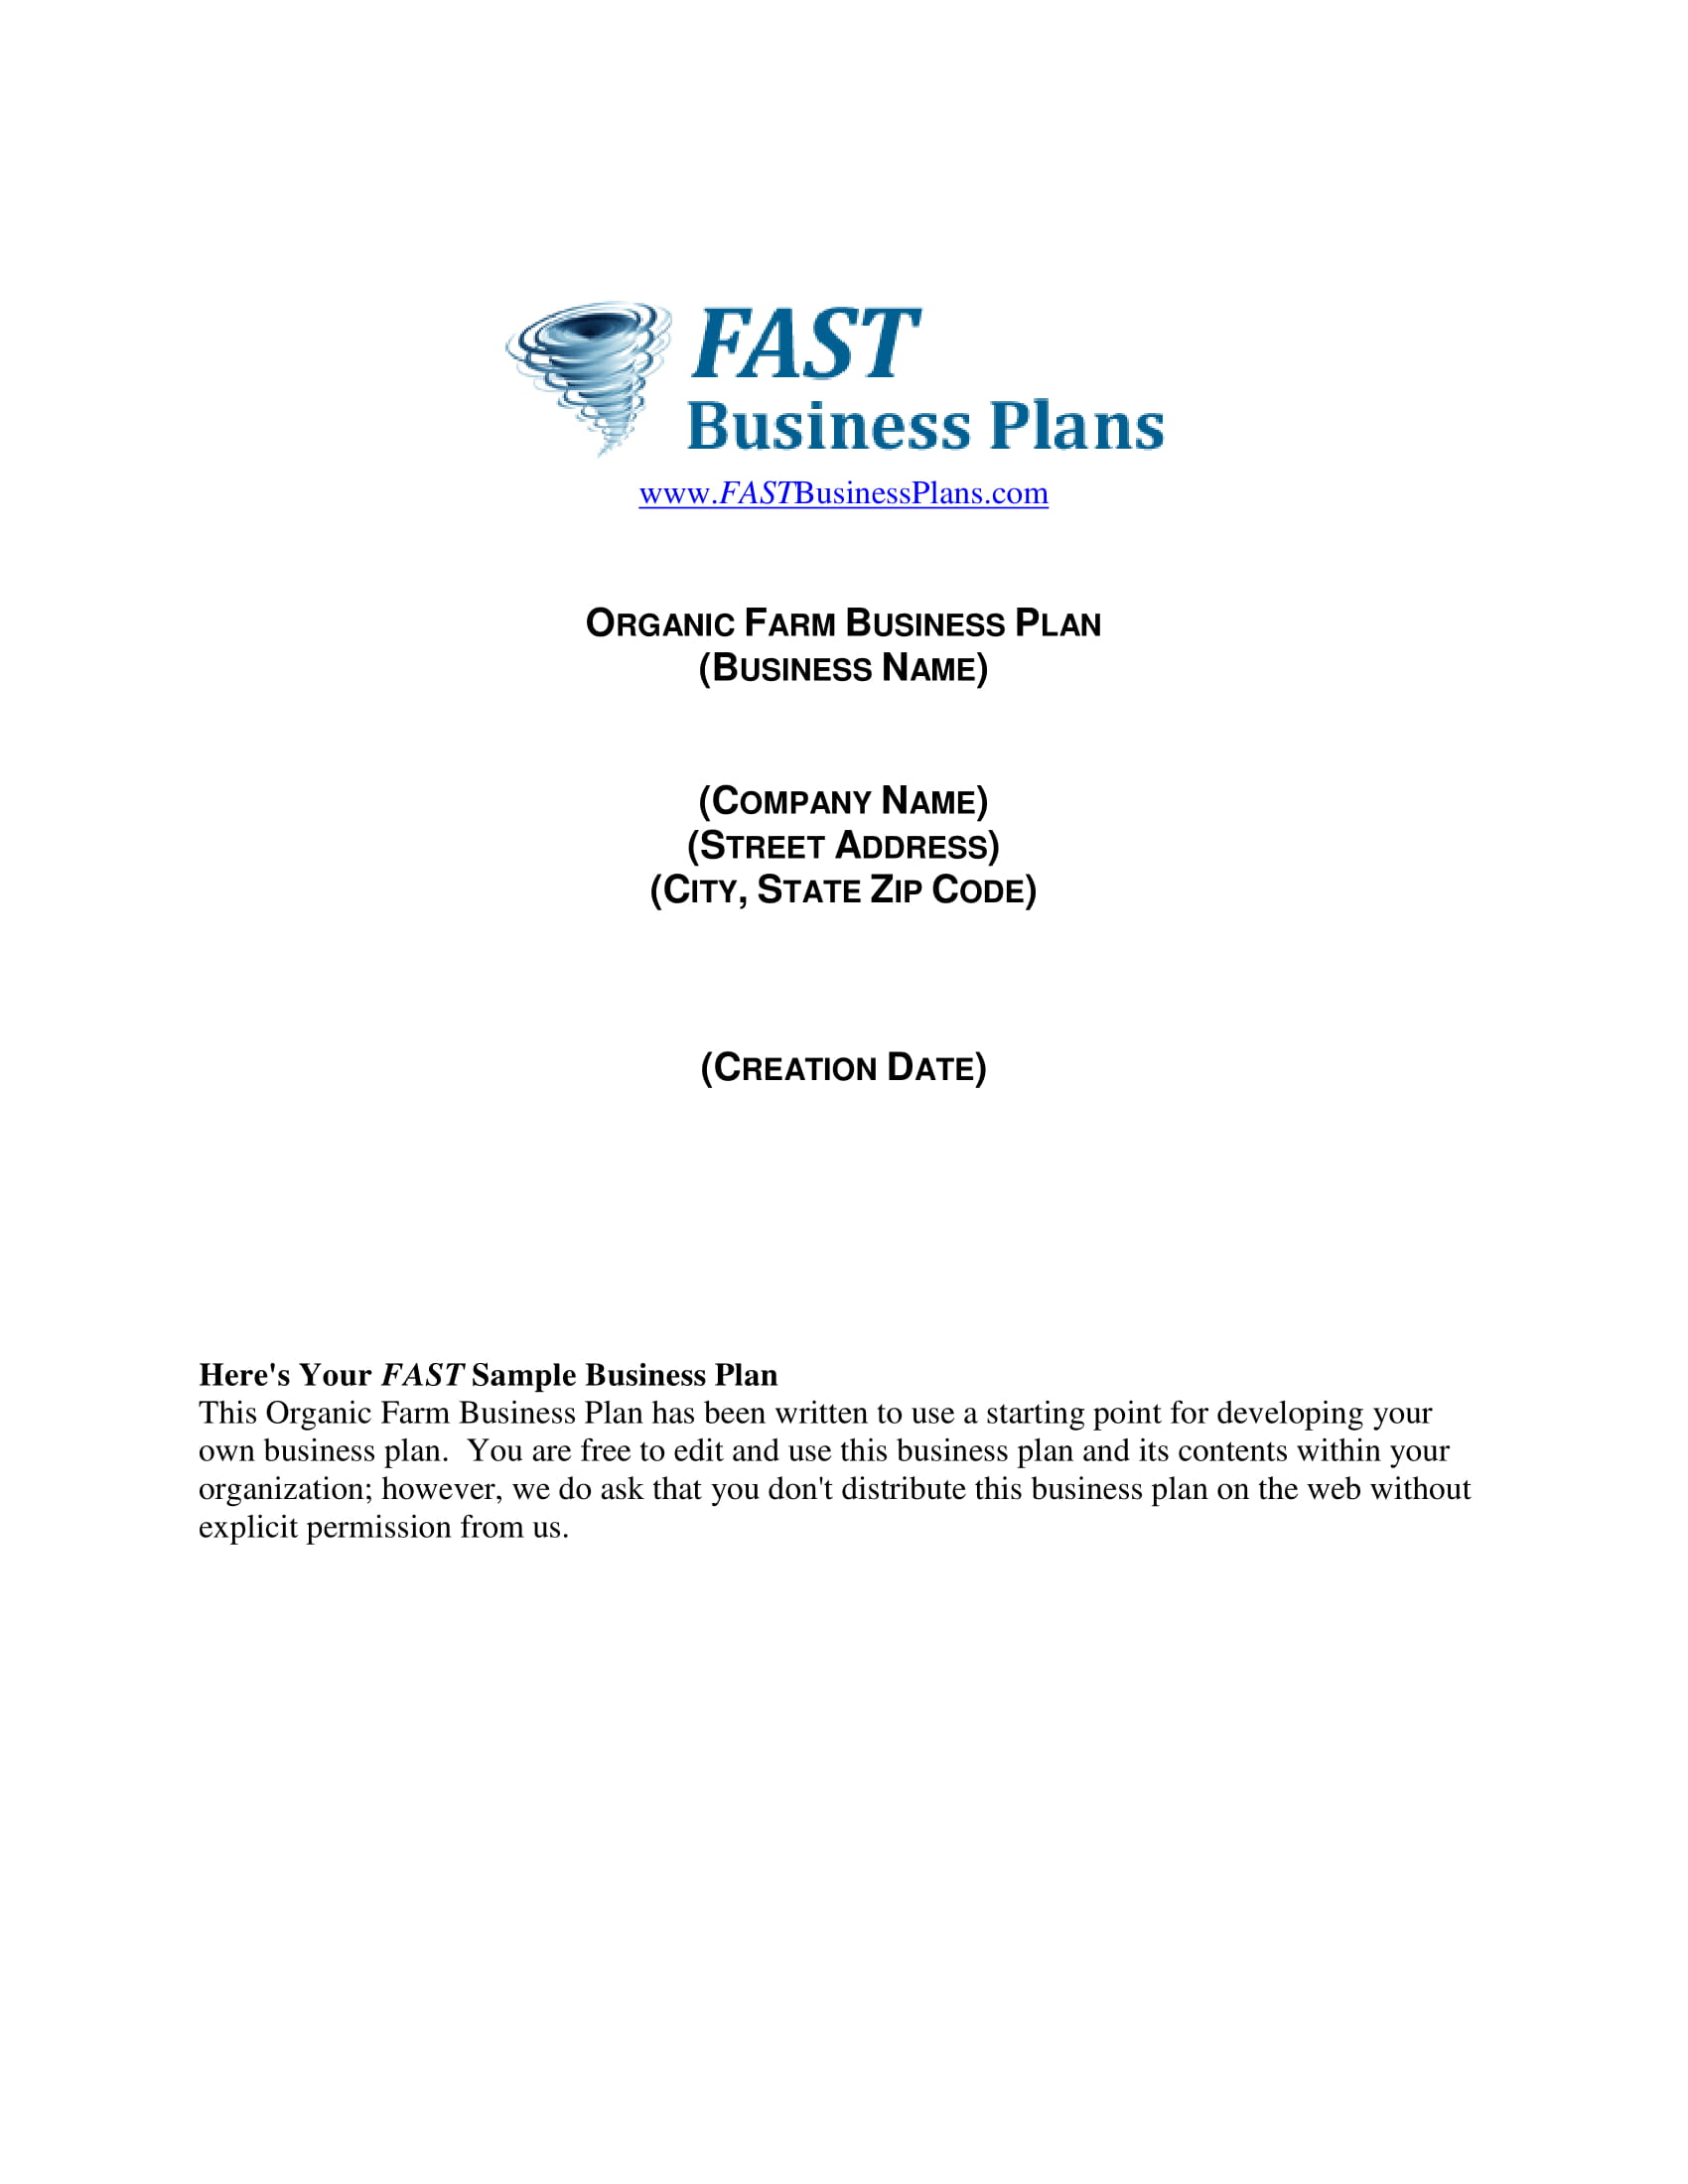 organic farm business plan example 01